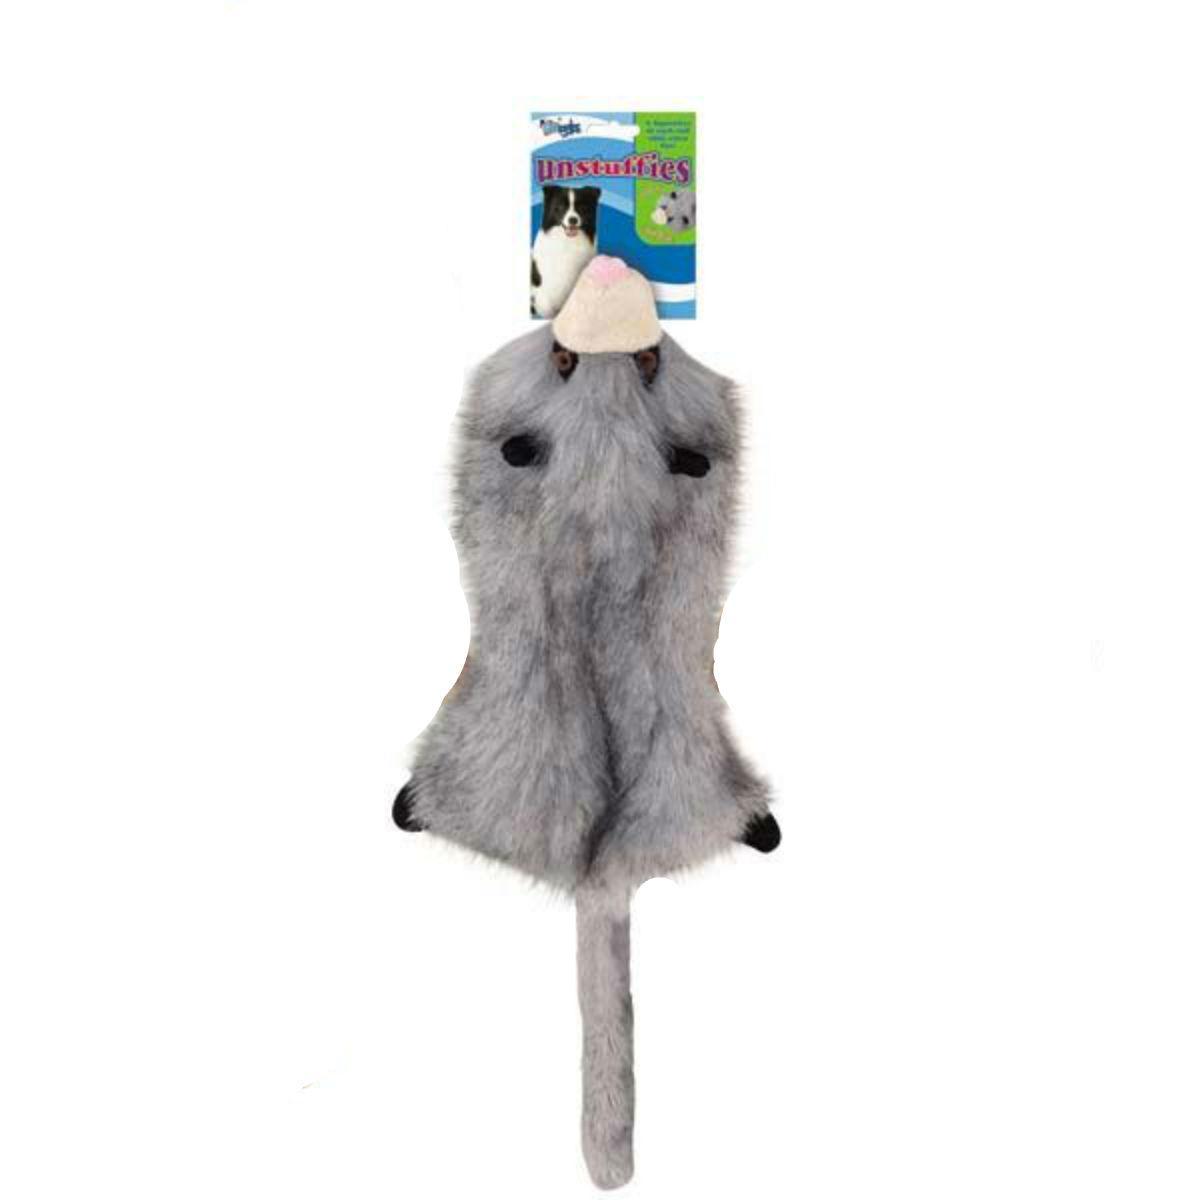 Grriggles Unstuffies Dog Toy - Opossum